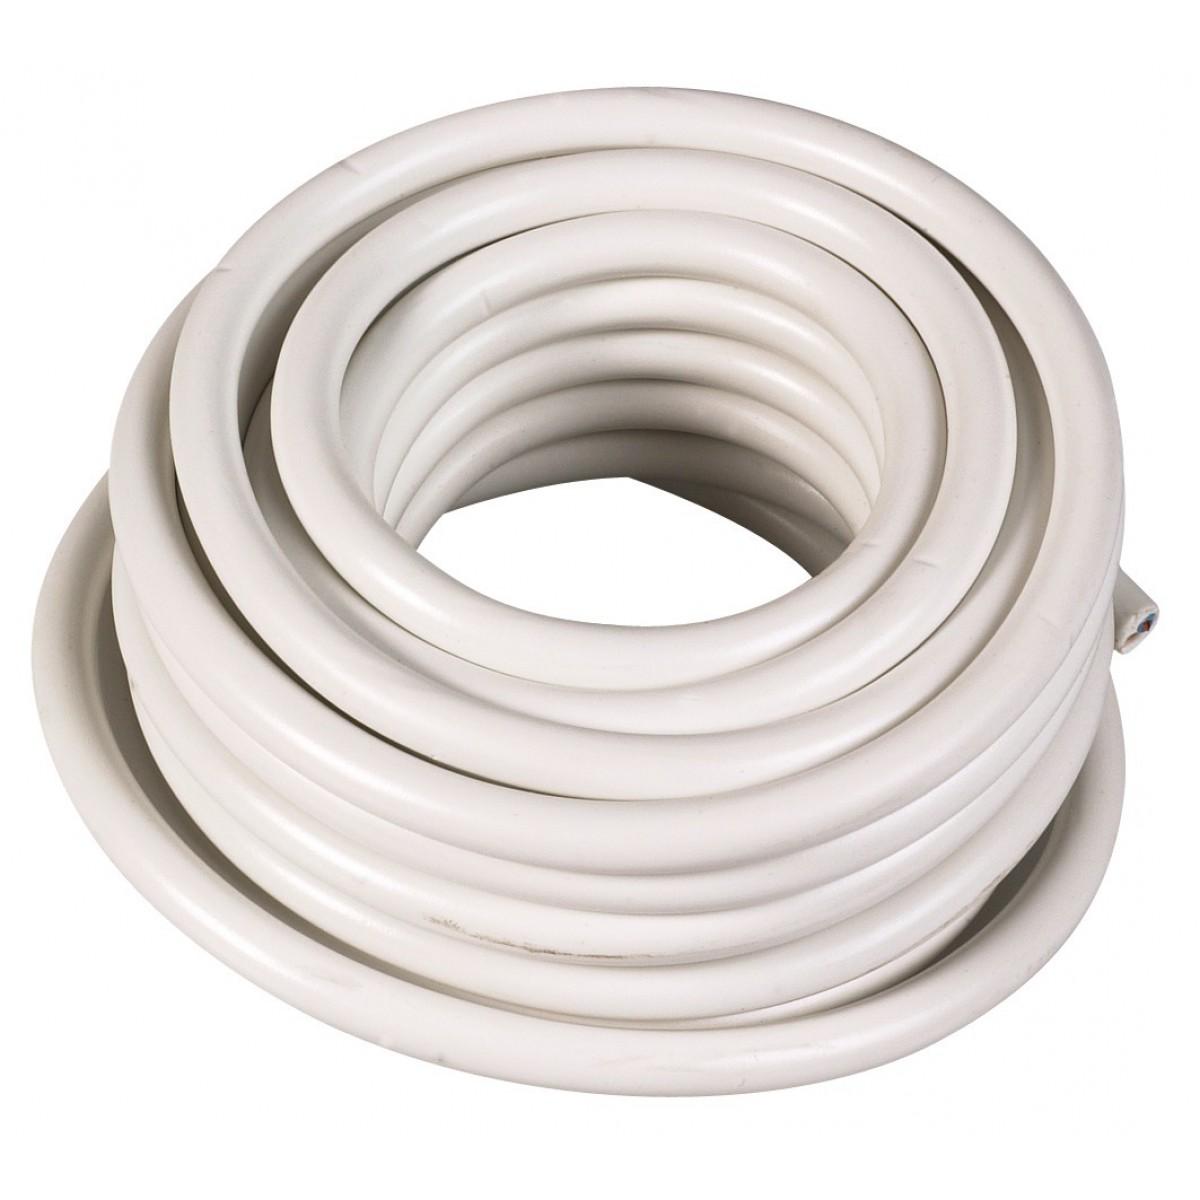 Câble H05 VV-F 1,5 mm² - Couronne 50 m - 5G1,5 mm² - Gris